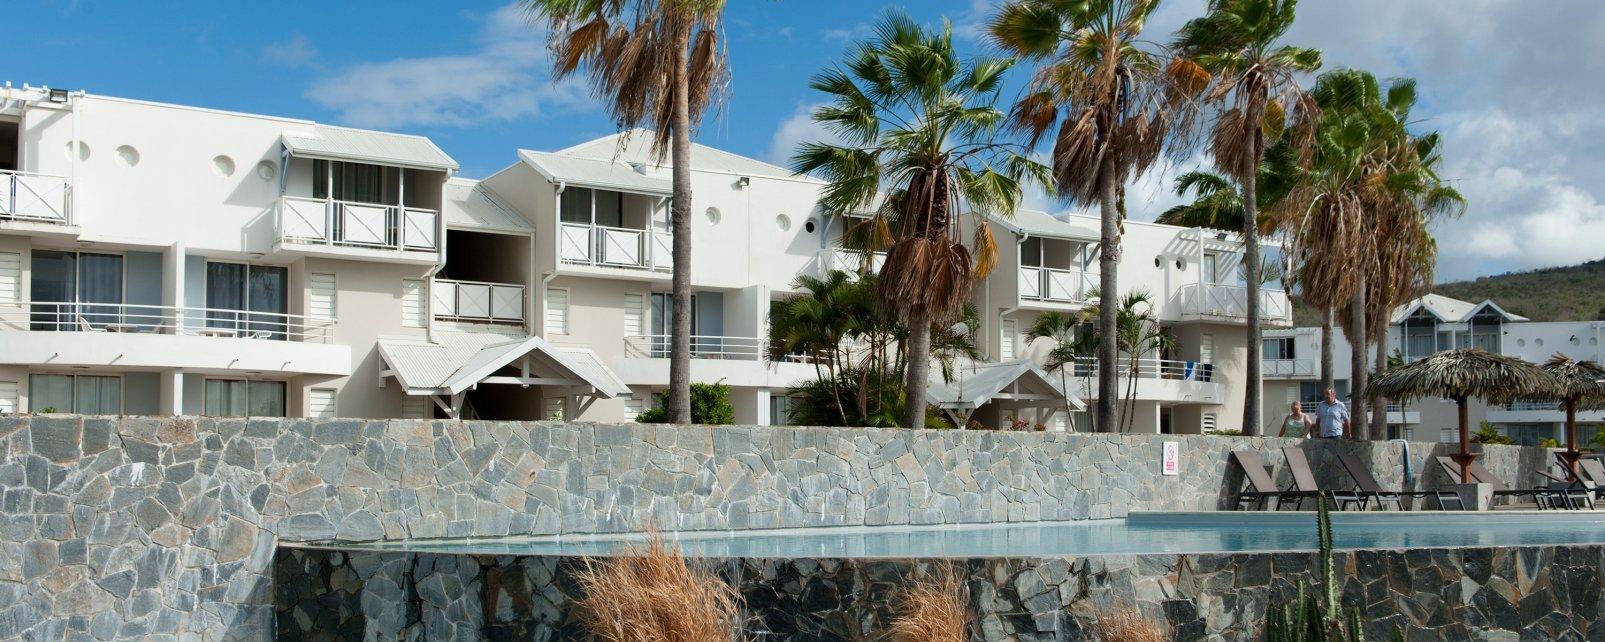 Hotel Karibéa Amyris